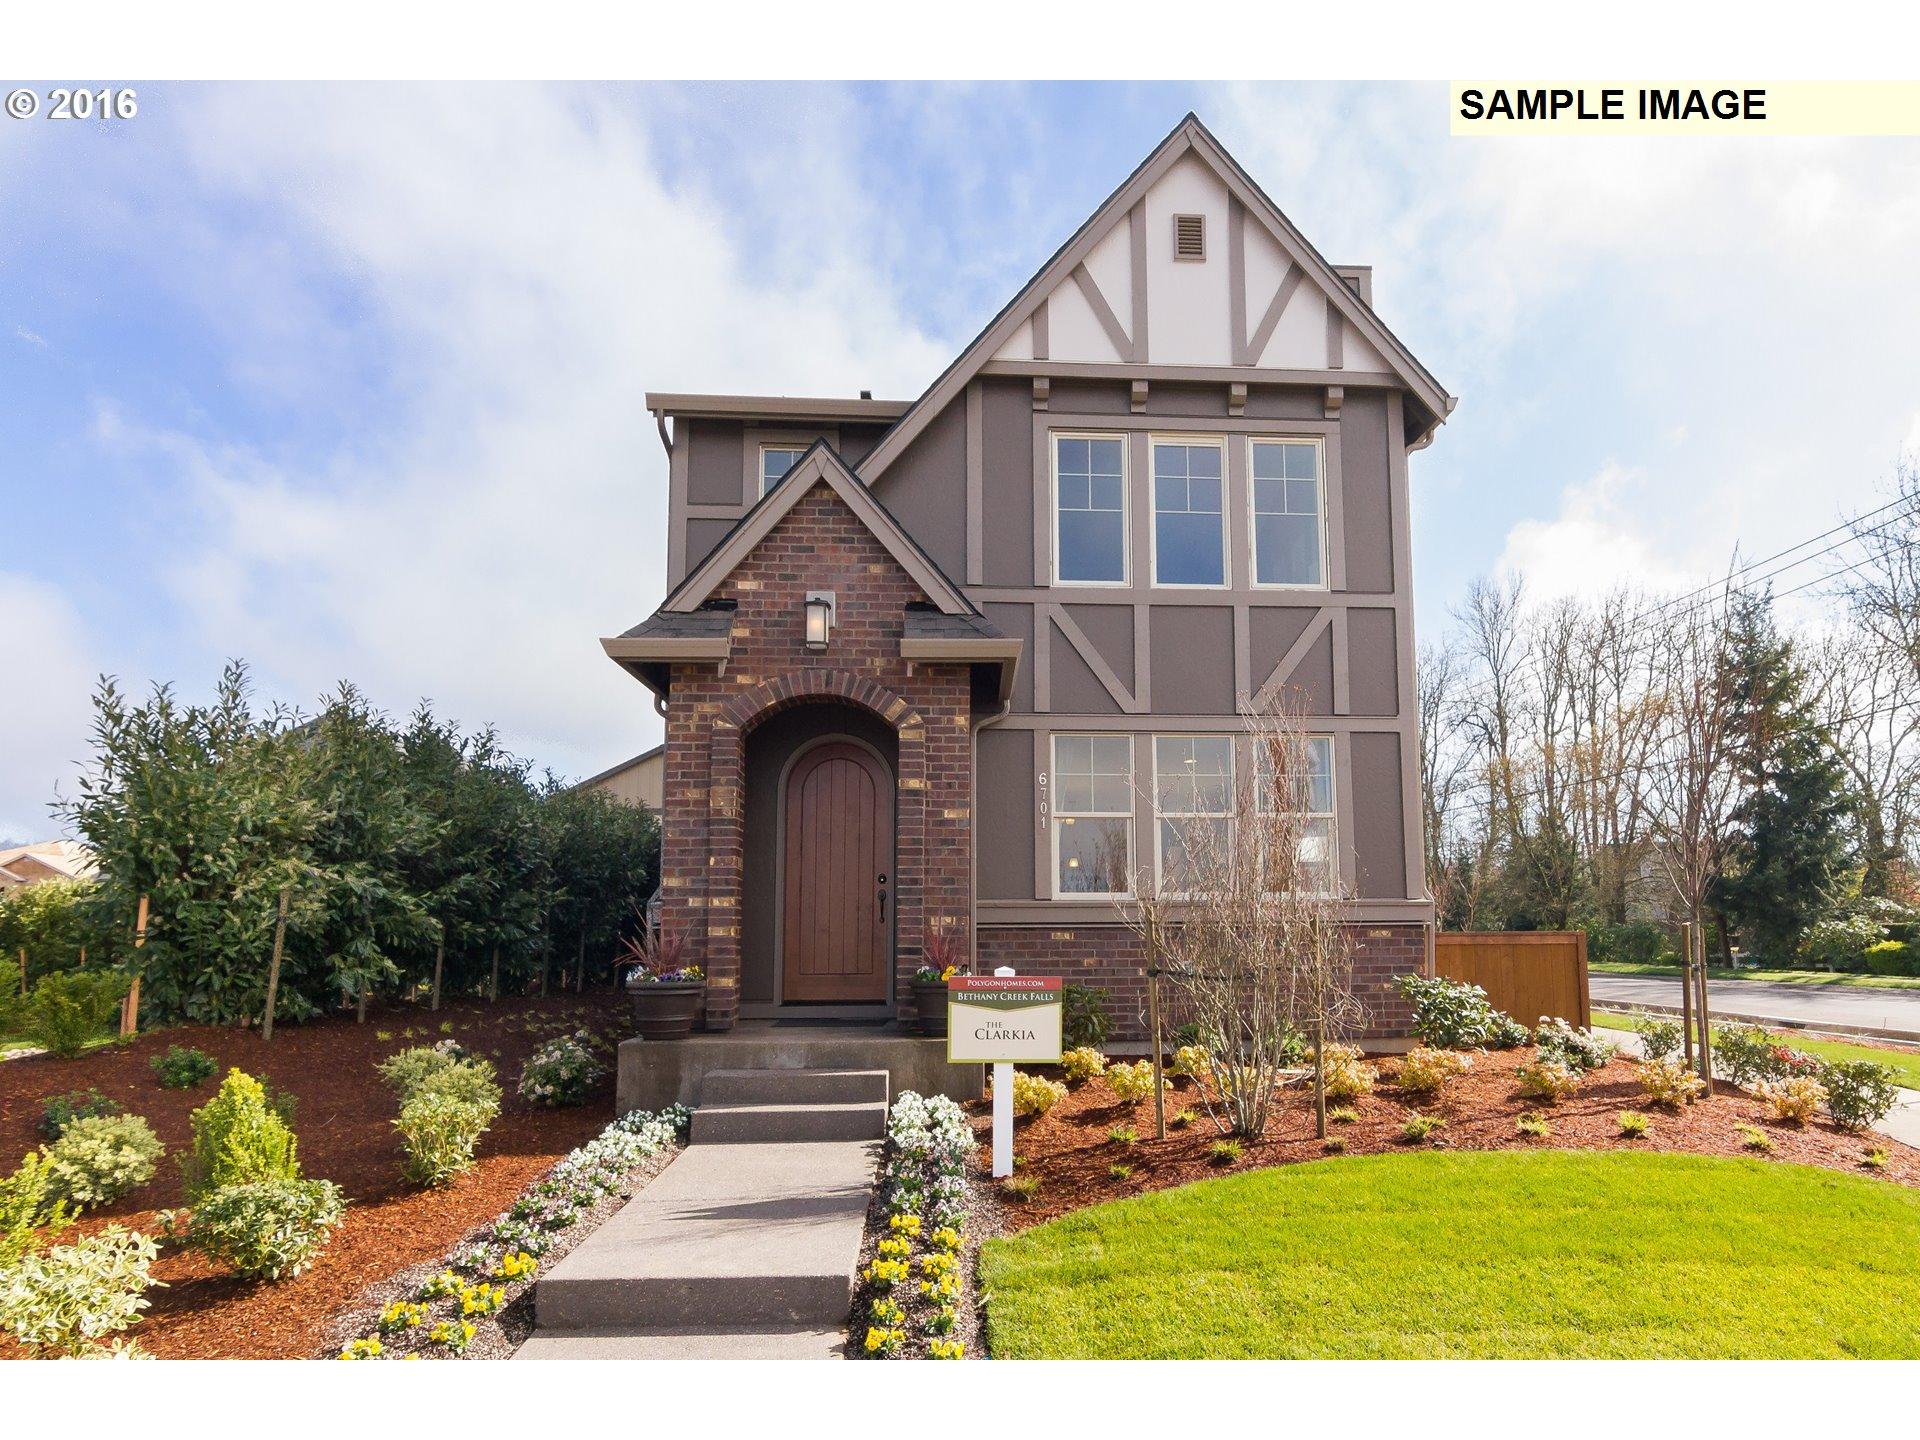 14934 NW Delia ST 305, Portland OR 97229